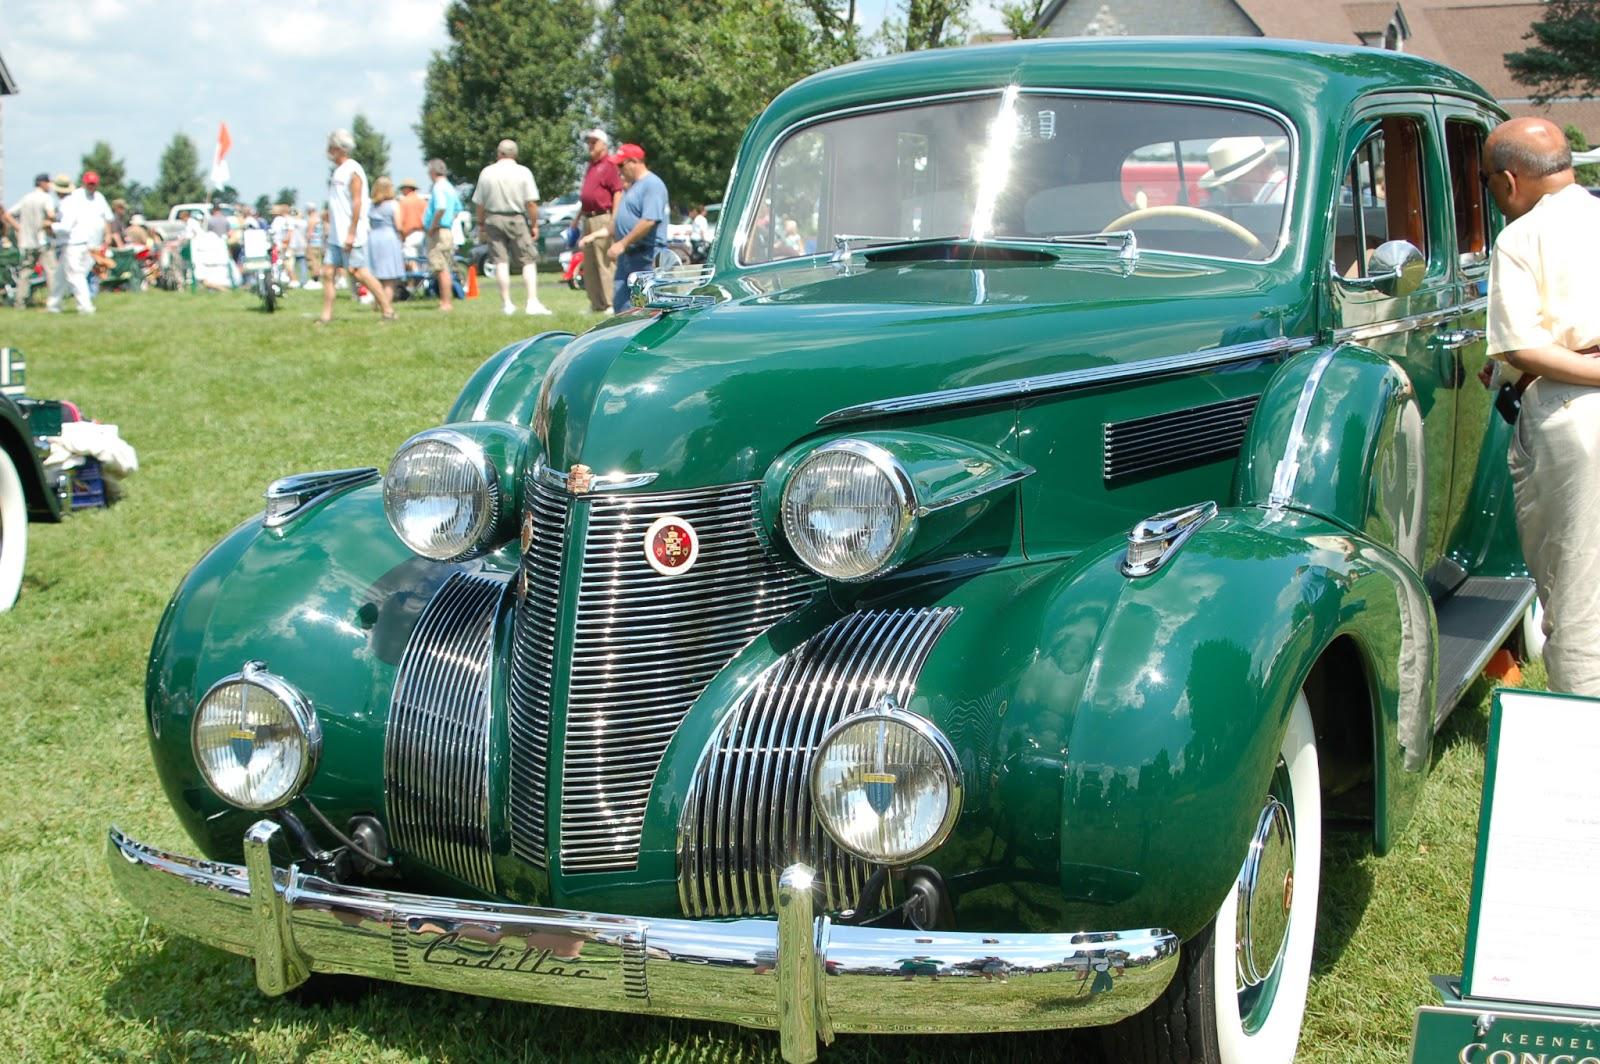 turnerbudds car blog pre war classics at keenland. Black Bedroom Furniture Sets. Home Design Ideas